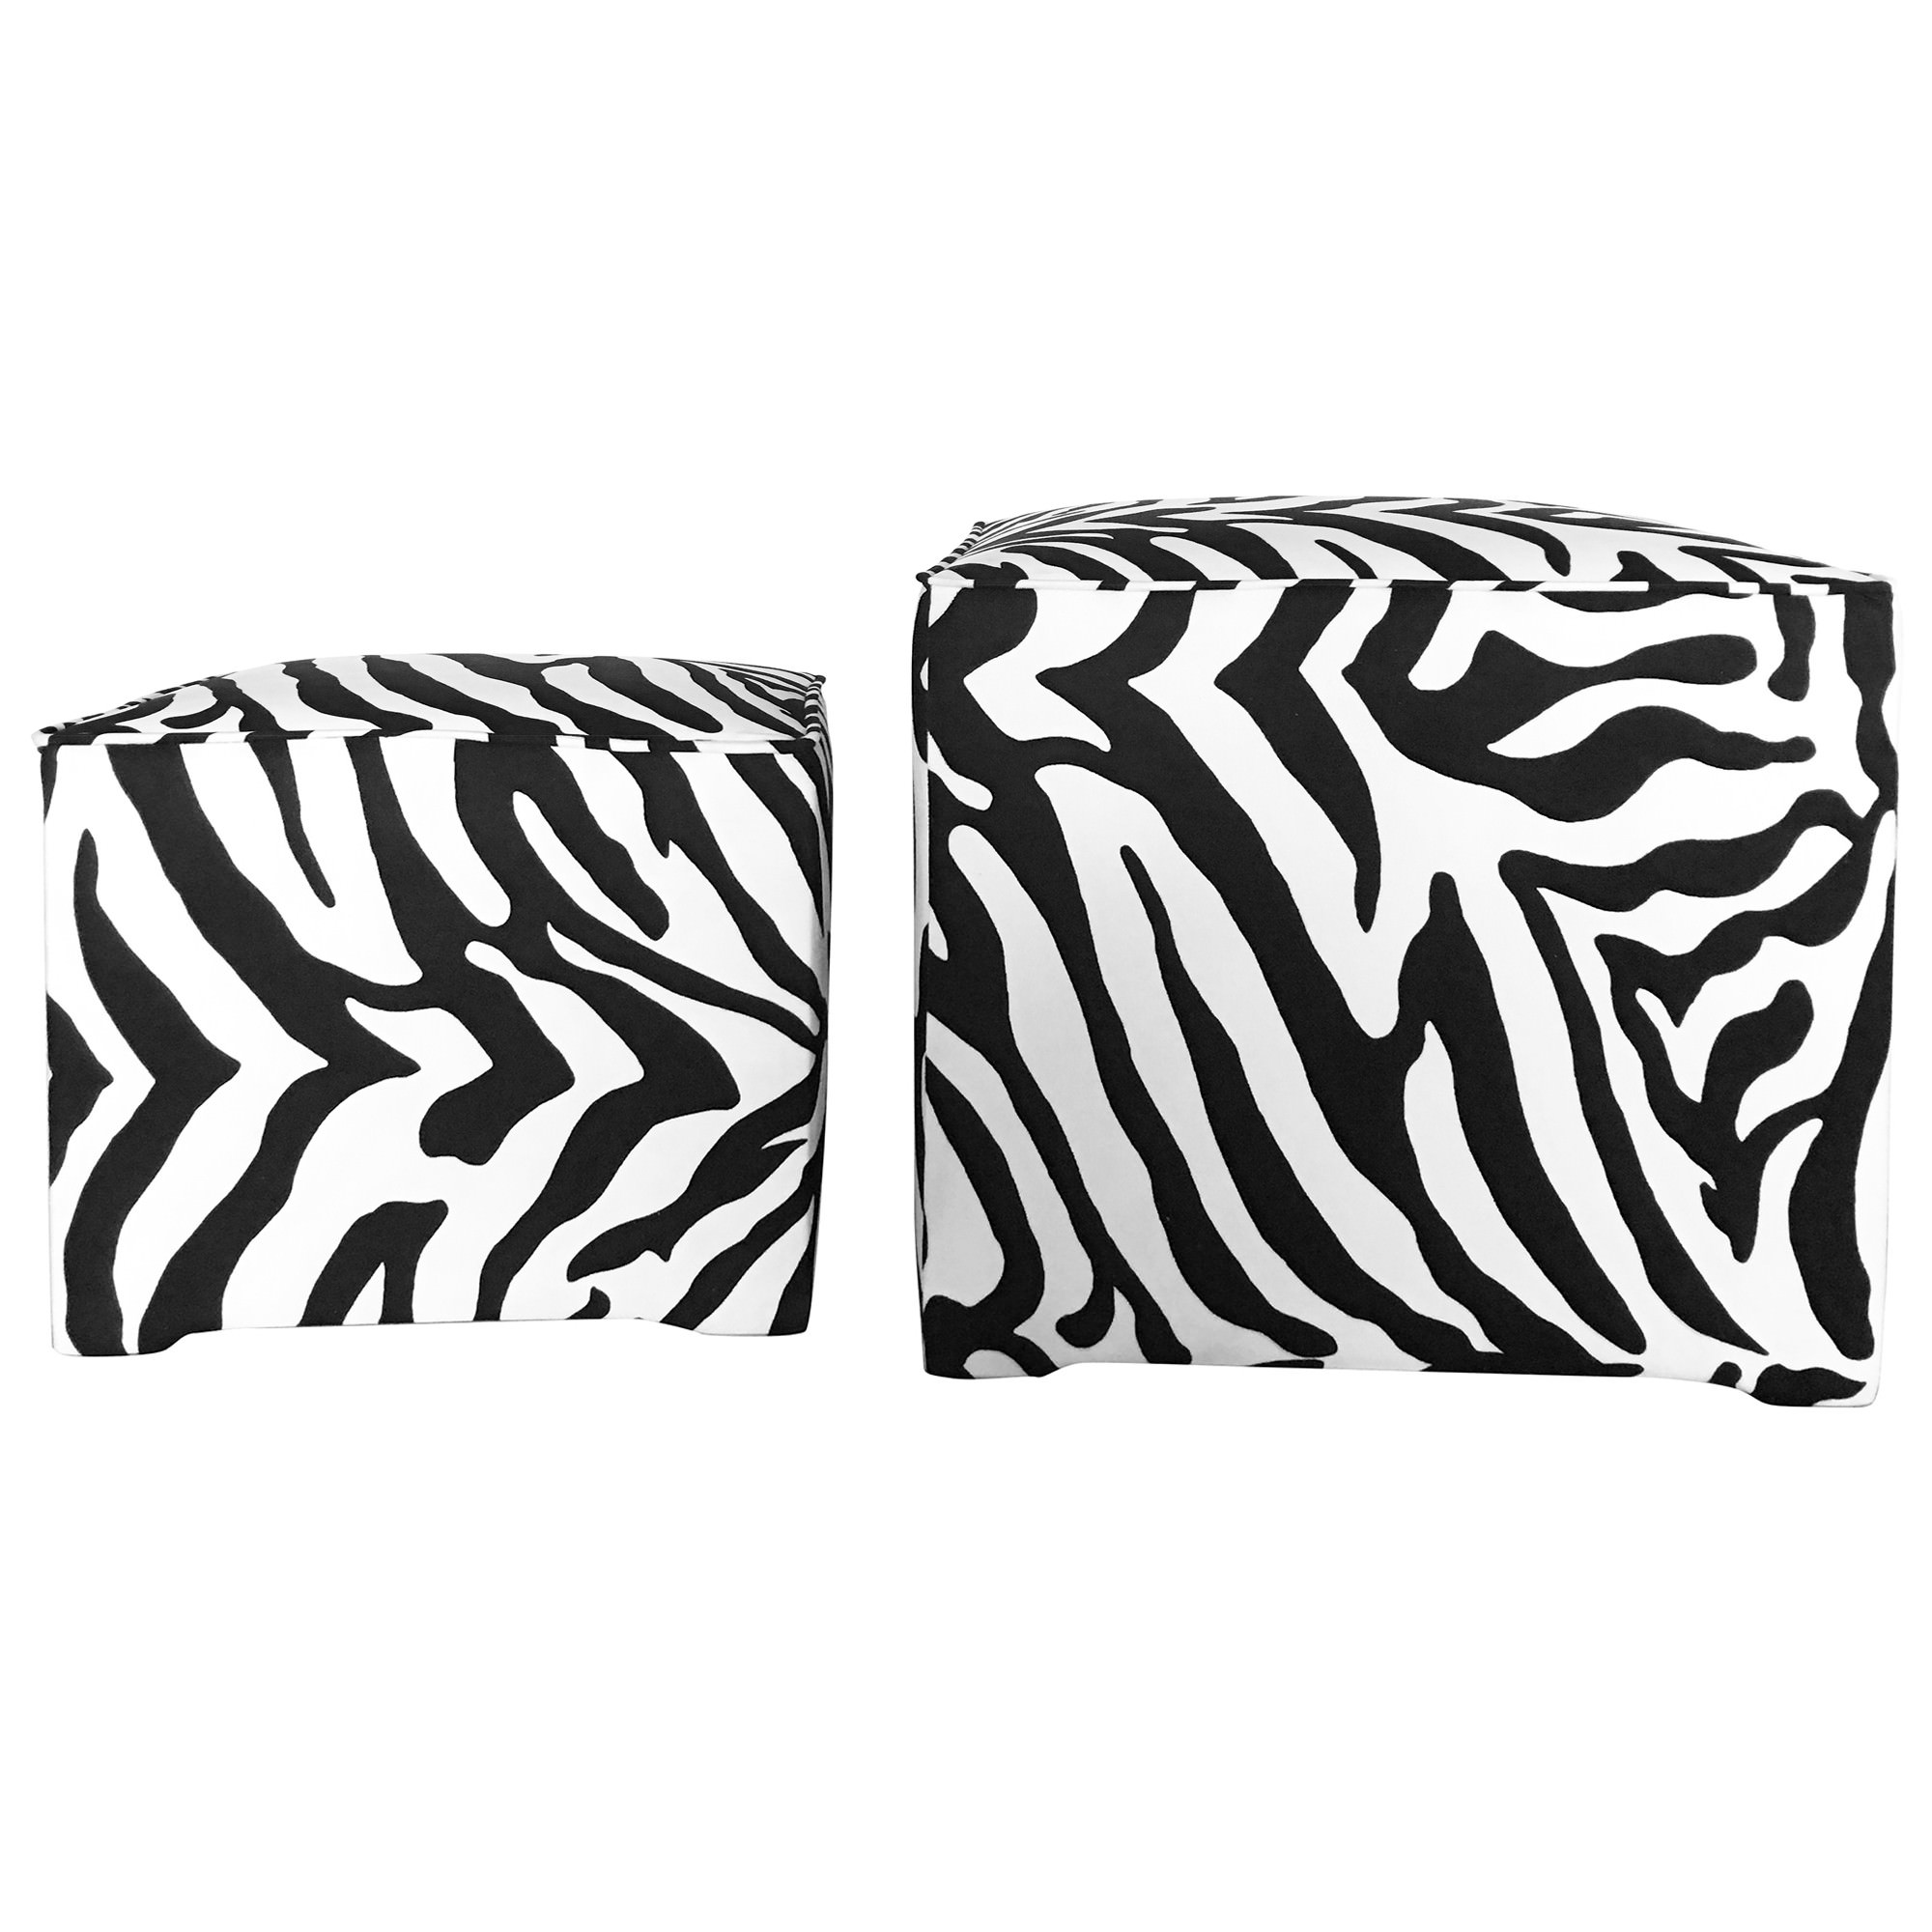 Denistone 2 Piece Zebra Fabric Foot Stool Set